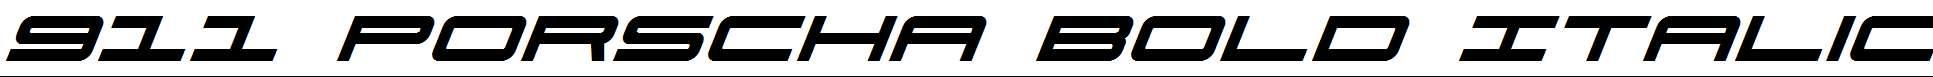 911-Porscha-Bold-Italic